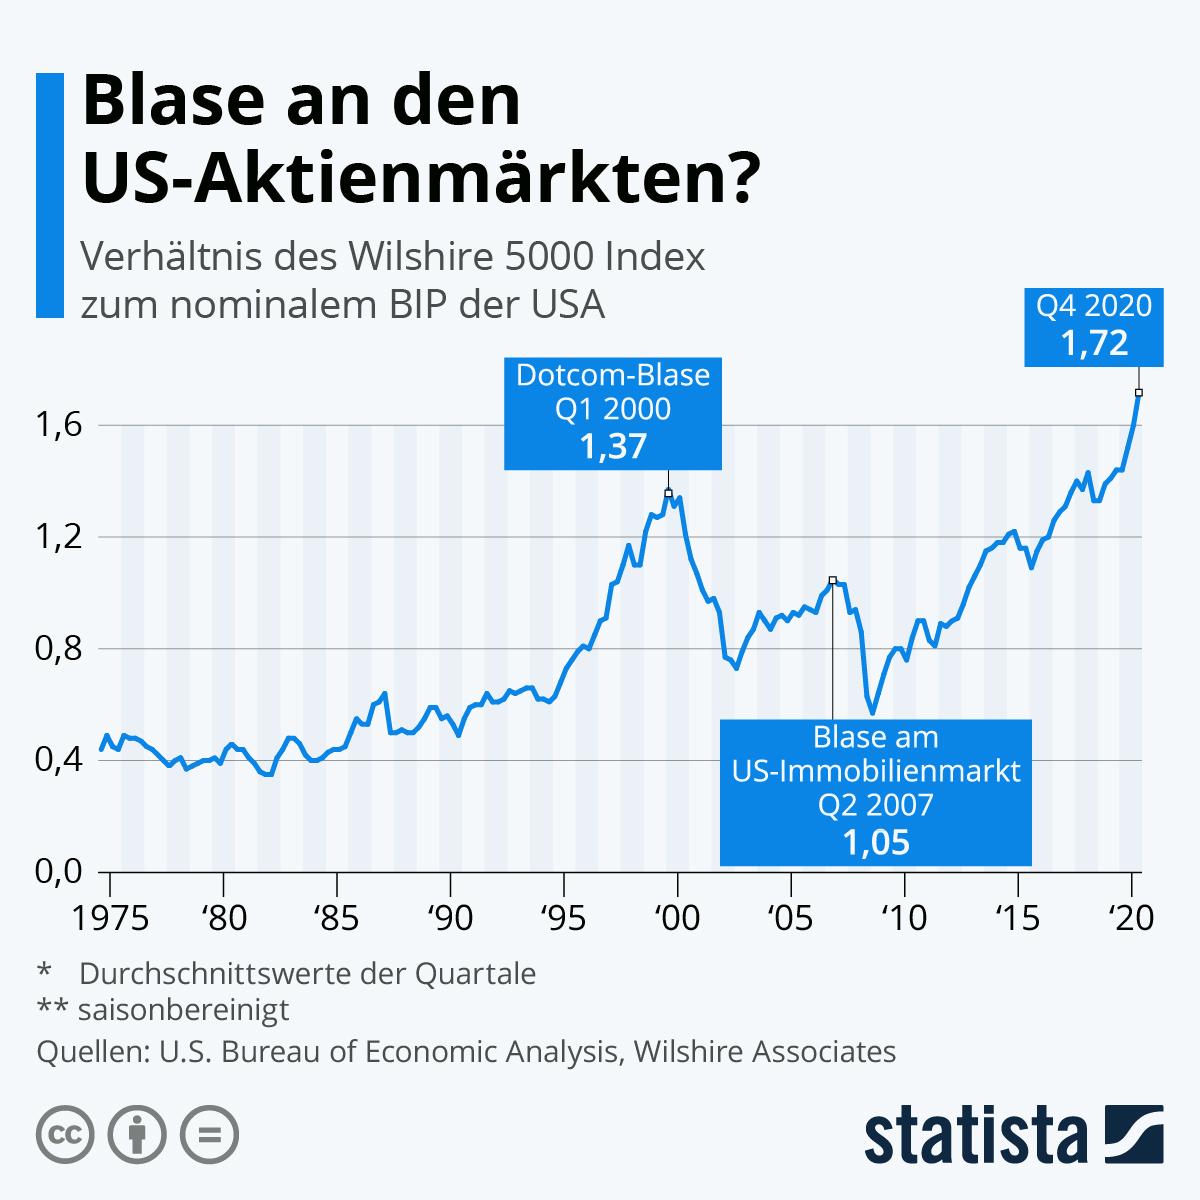 Wilshire 5000 im Verhältnis zum US-BIP